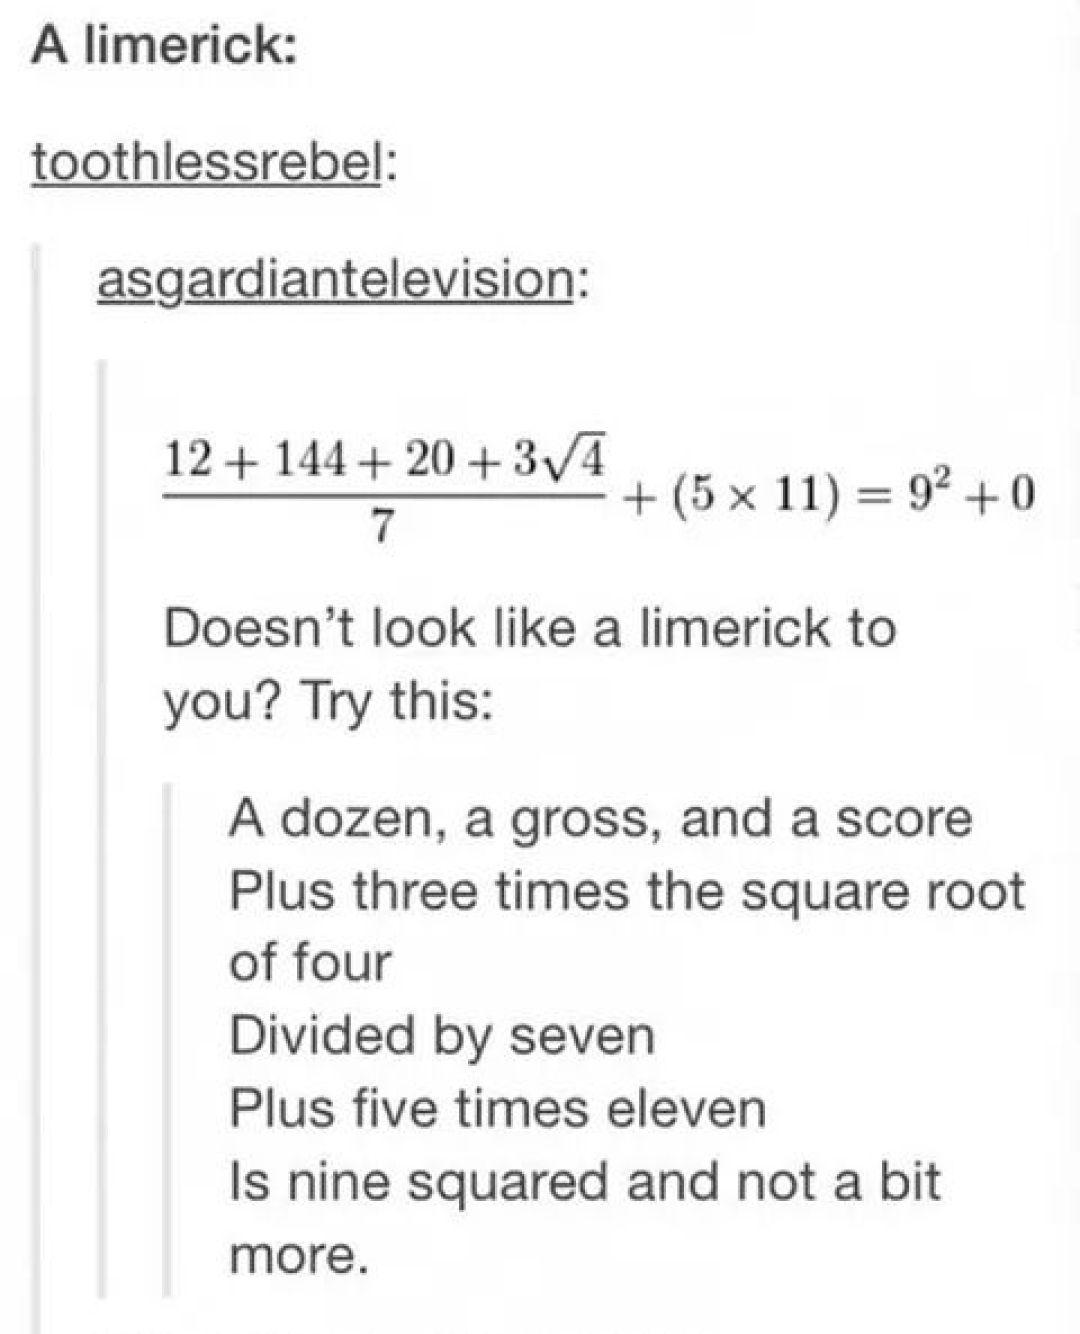 A Dozen A Gross And A Score Plus Three Times The Square